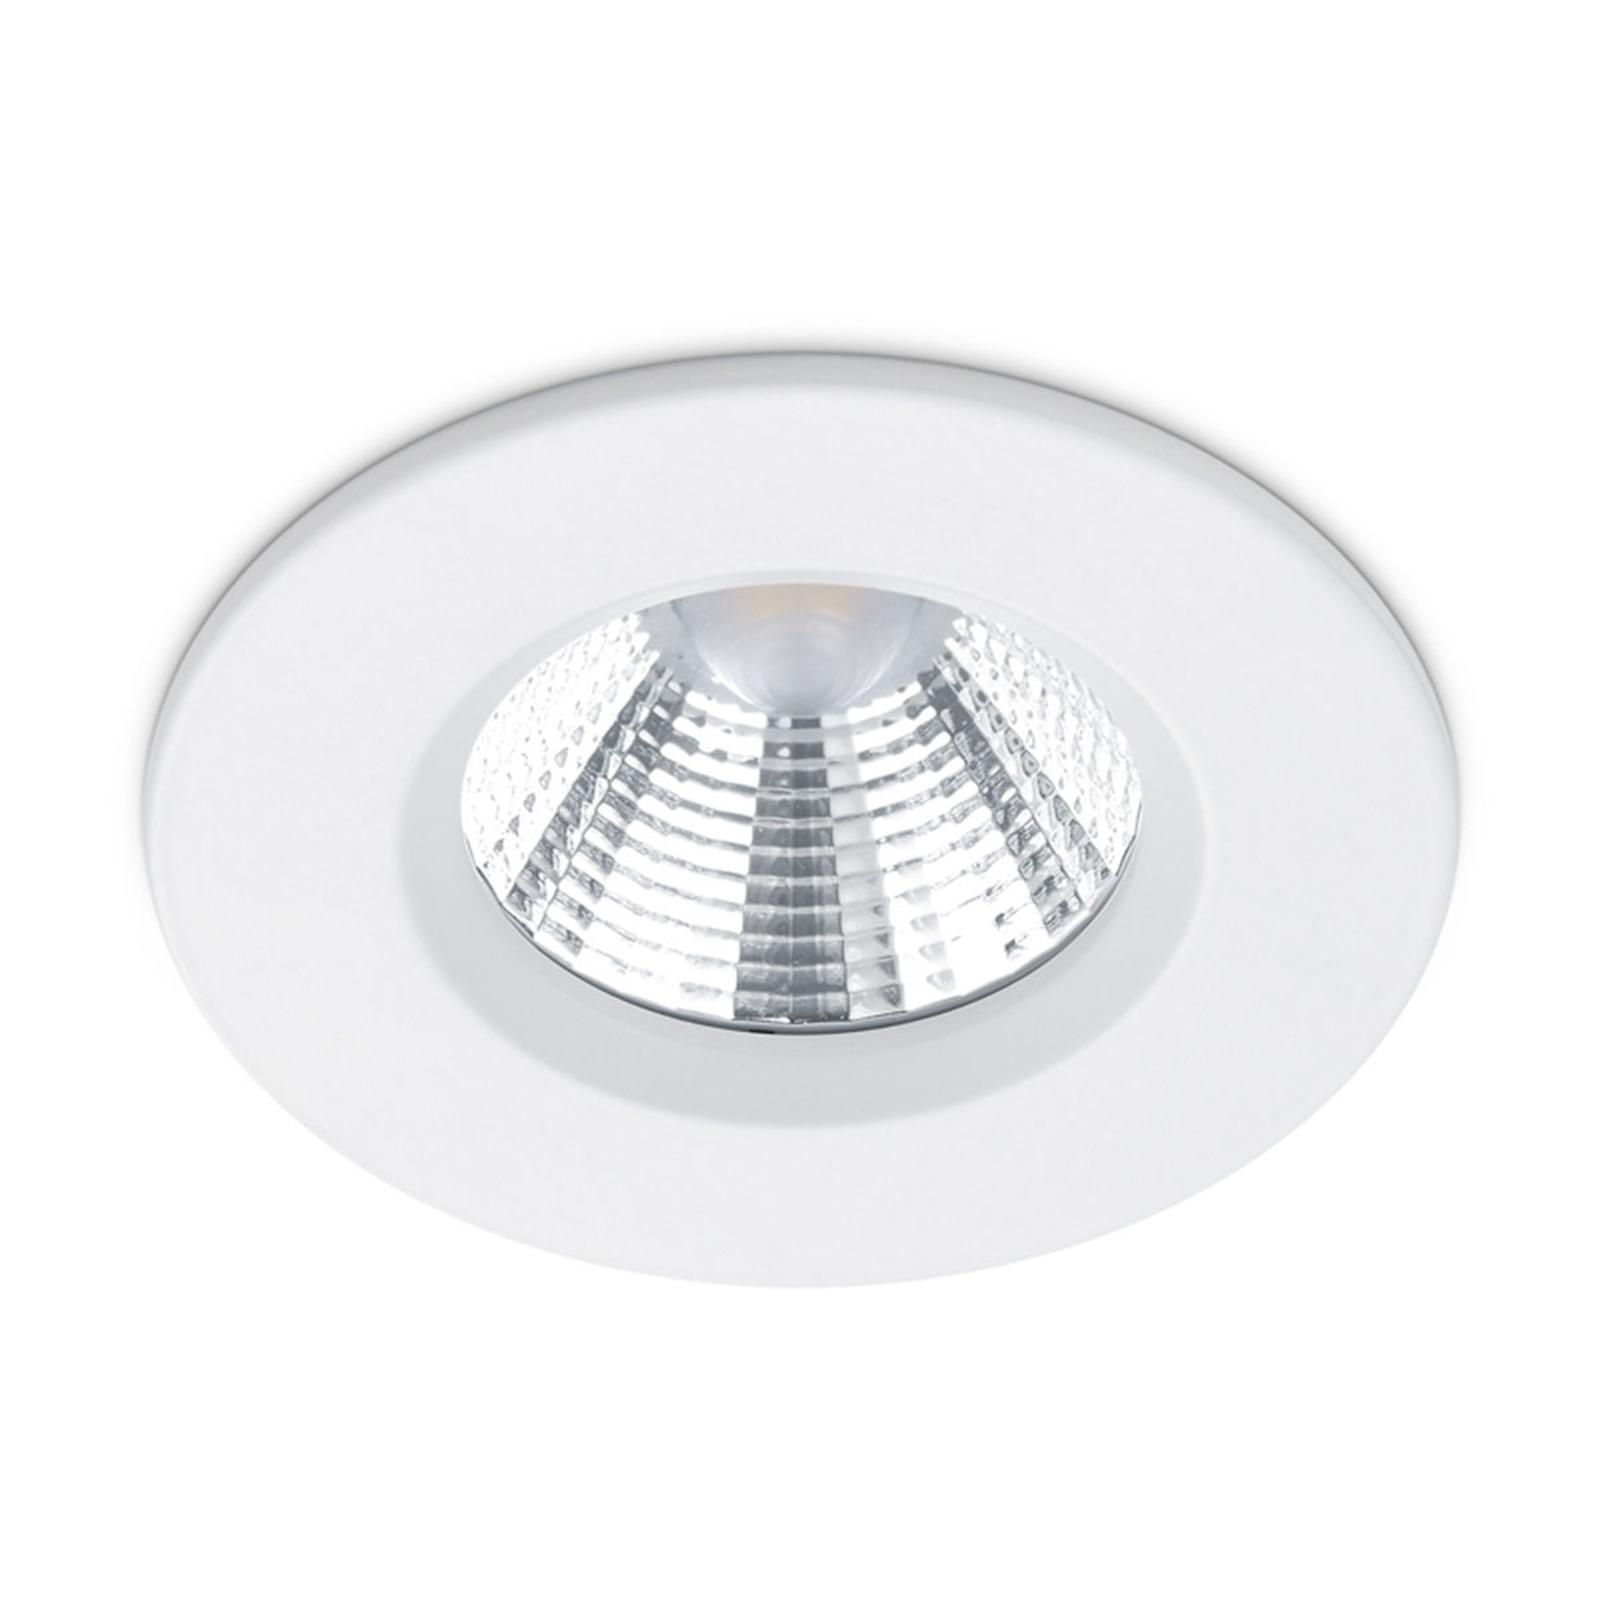 Spot LED Zagros IP65, bianco